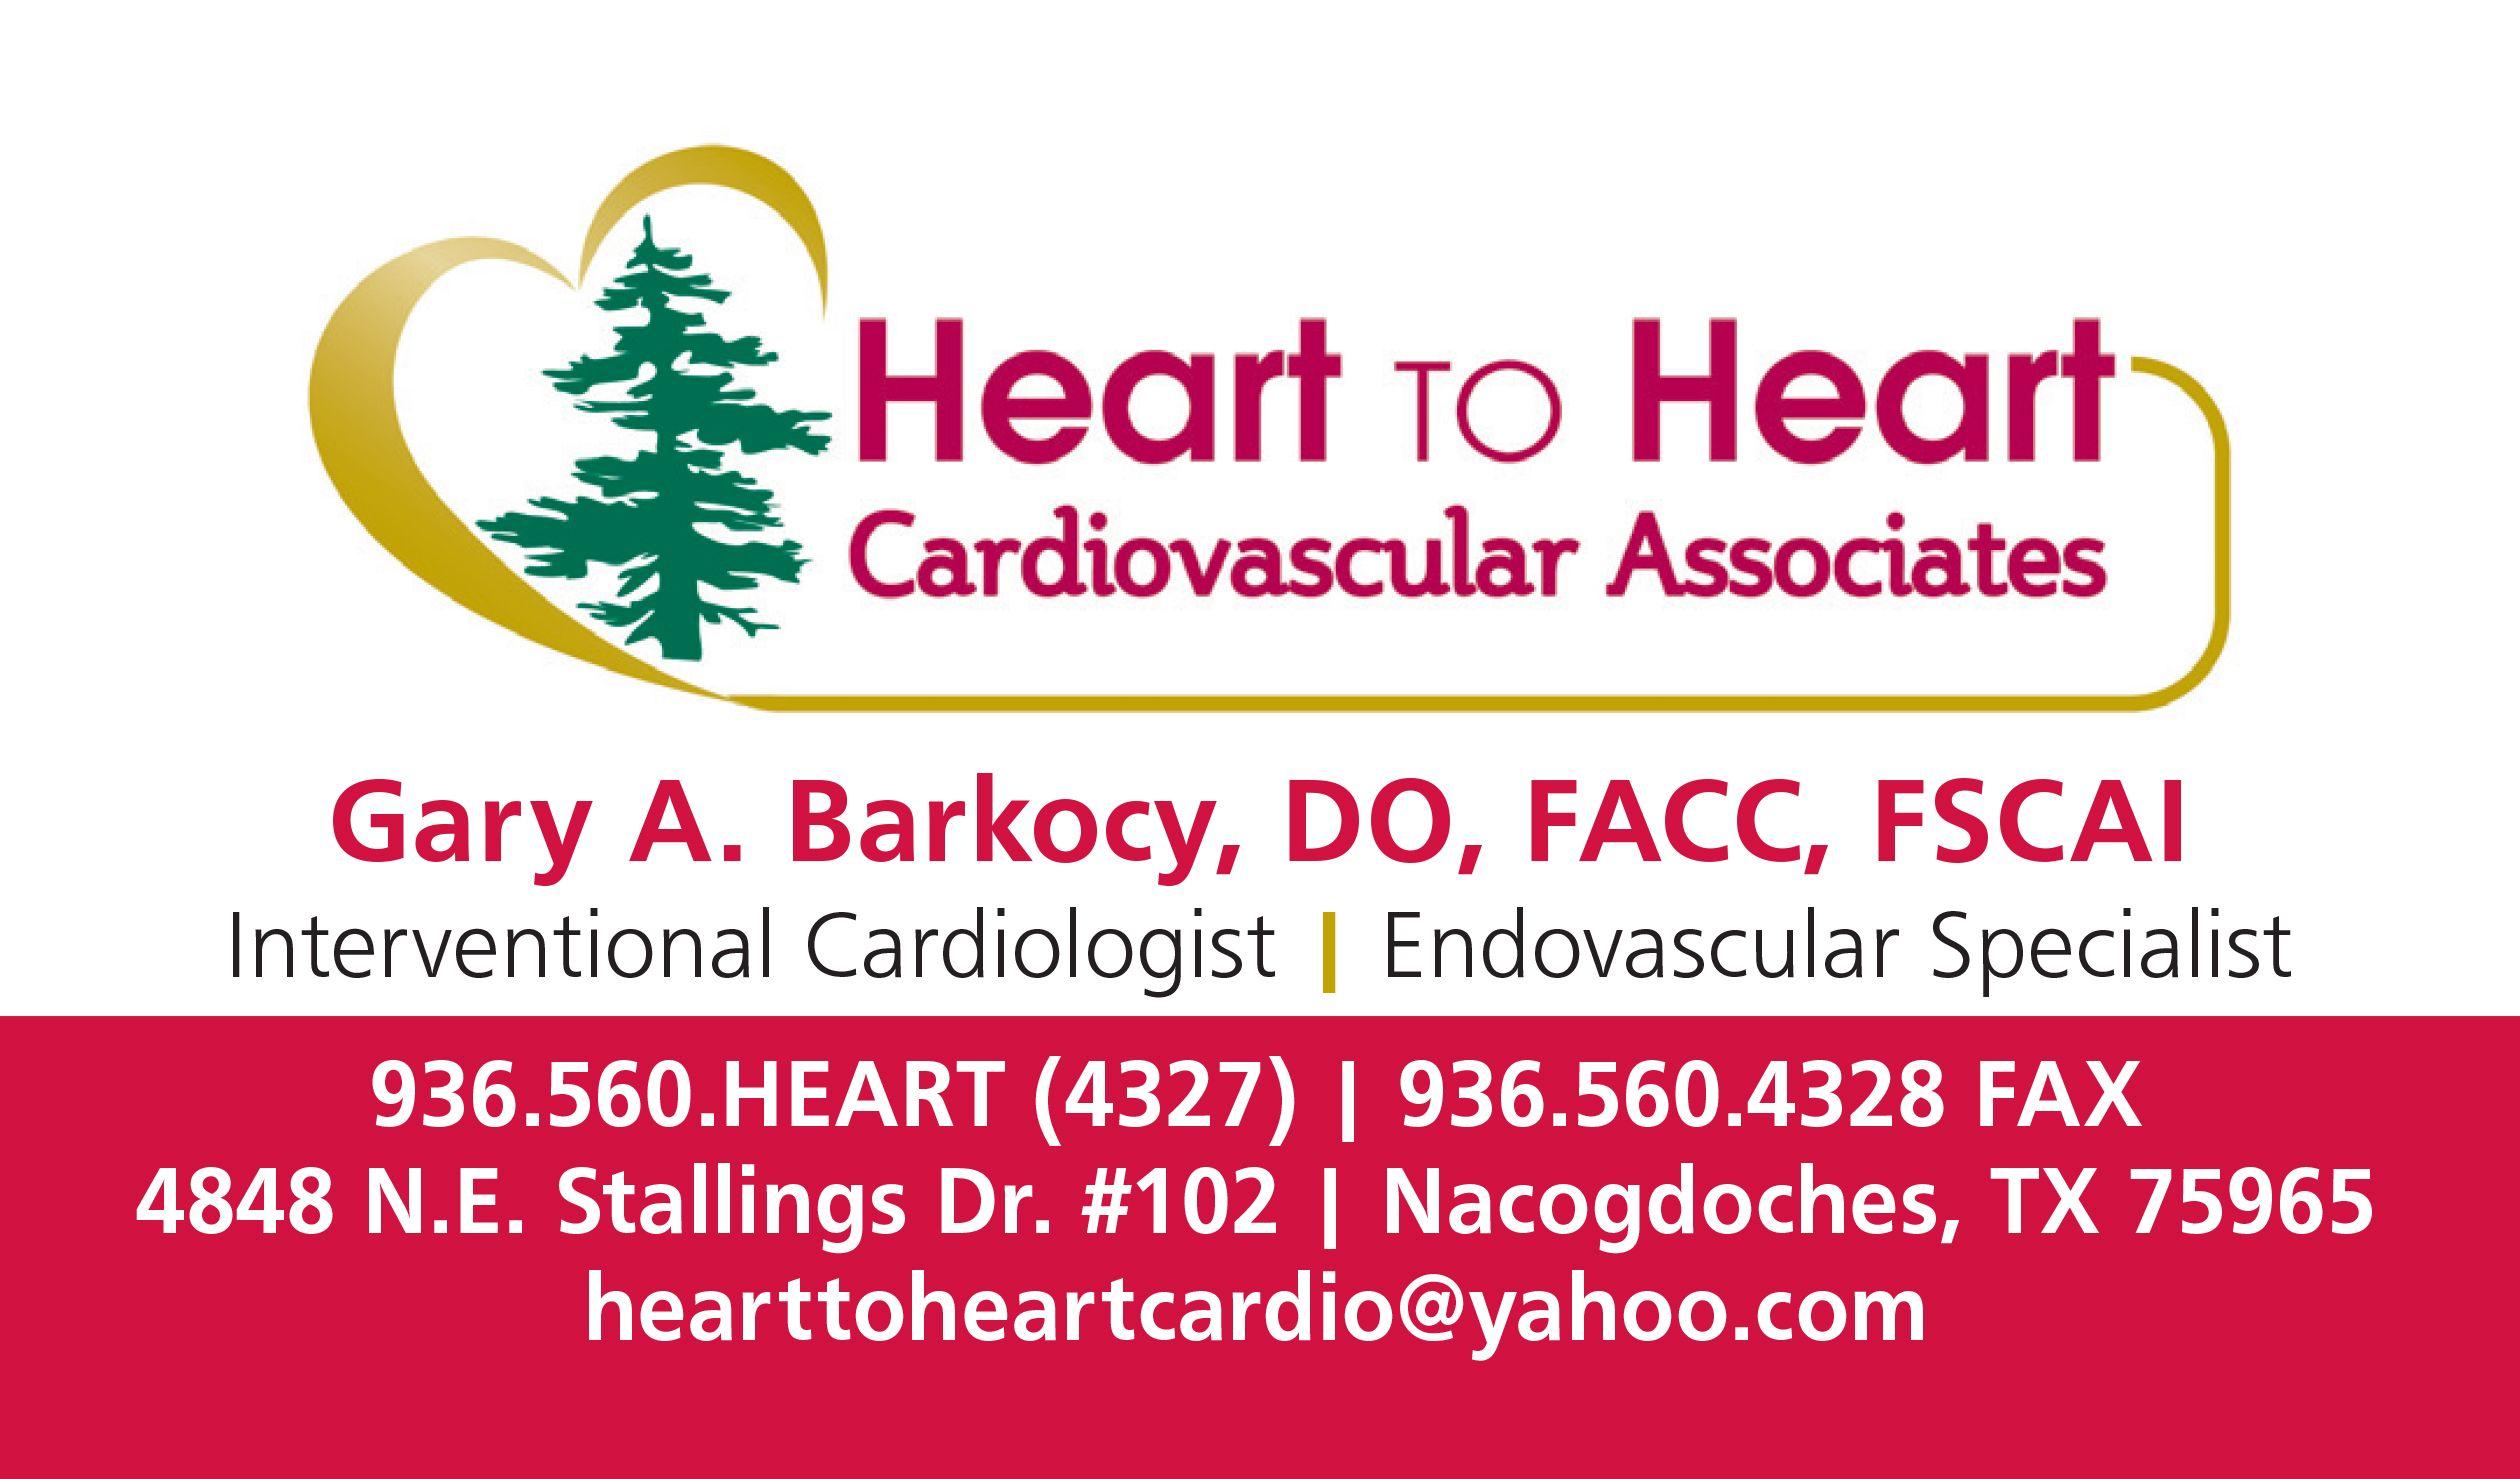 cardiovascular associates business card | Business Cards